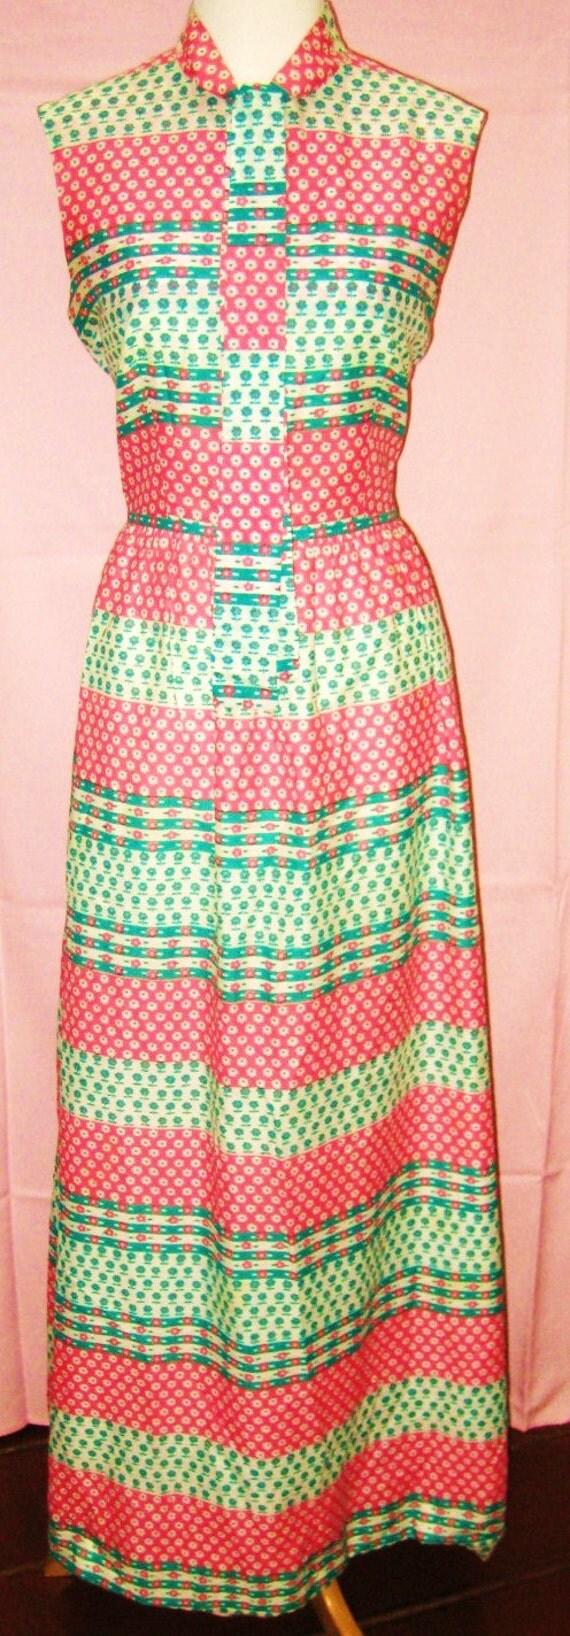 Vintage-70s-Maxi Dress-Pink-Blue-White-Sleeveless Maxi Dress-Silk Maxi Dress-M-L